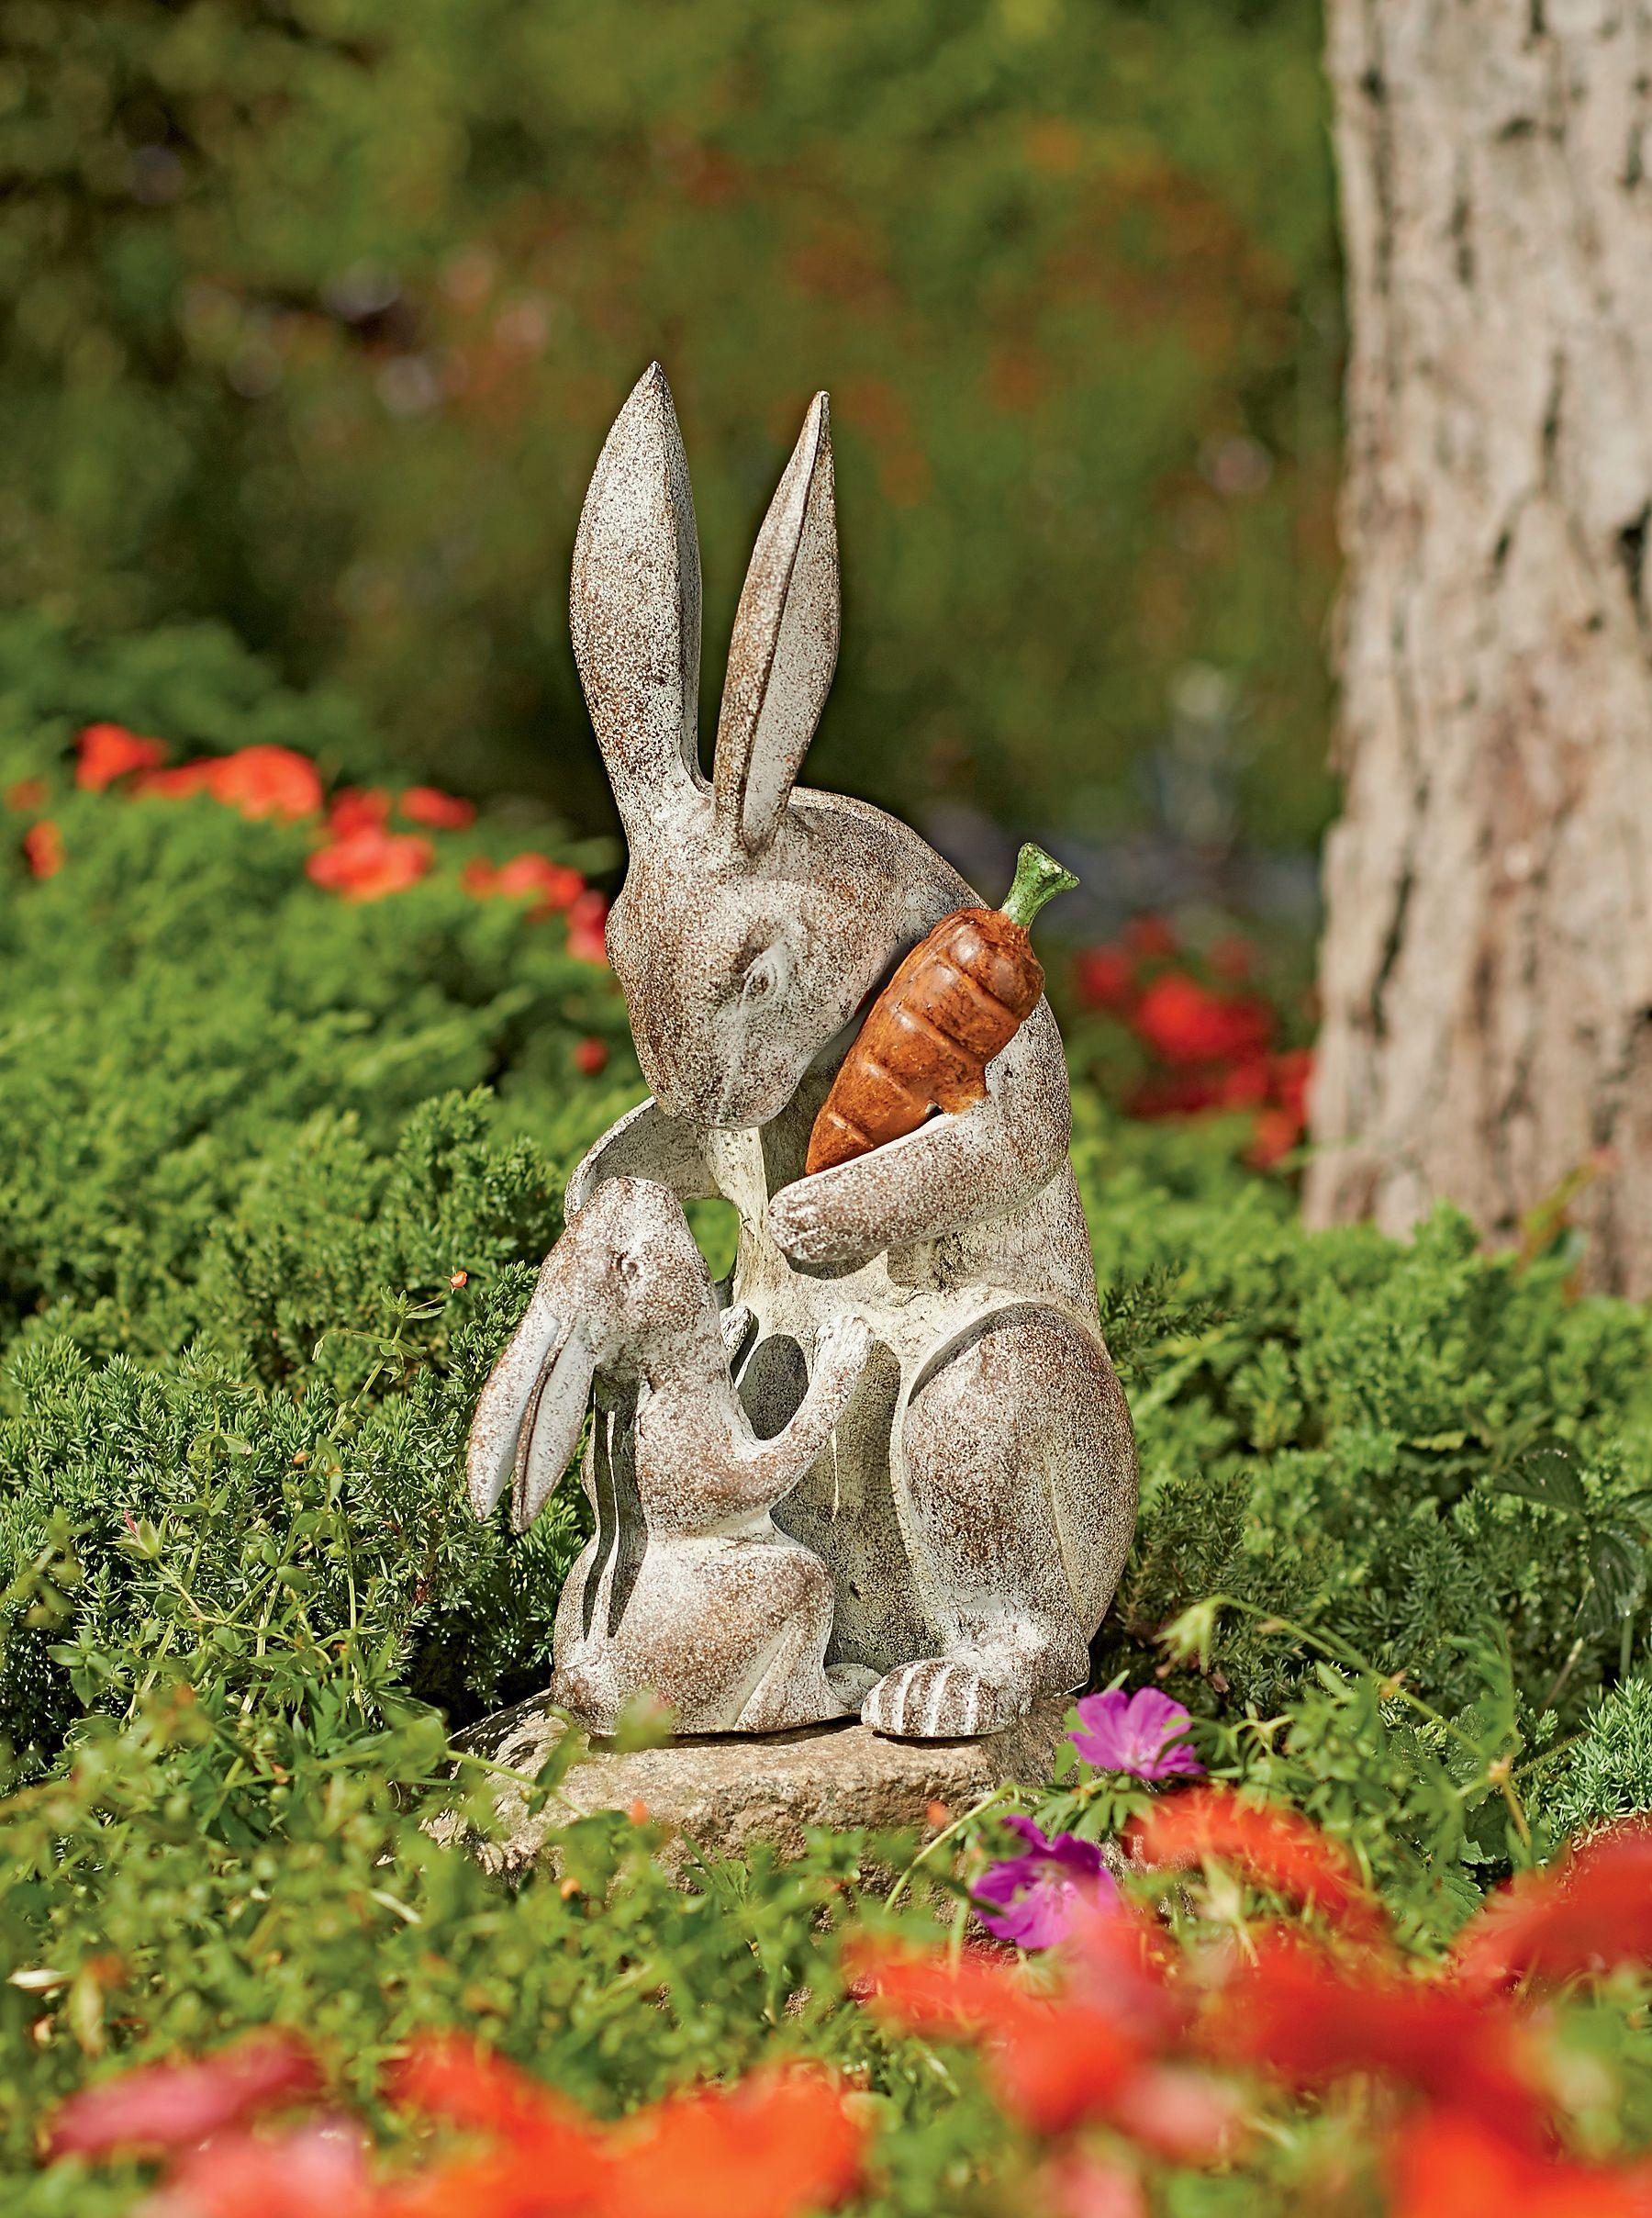 sculptures statue with angel your cat impressive sculpture thinking decorate designs wind garden